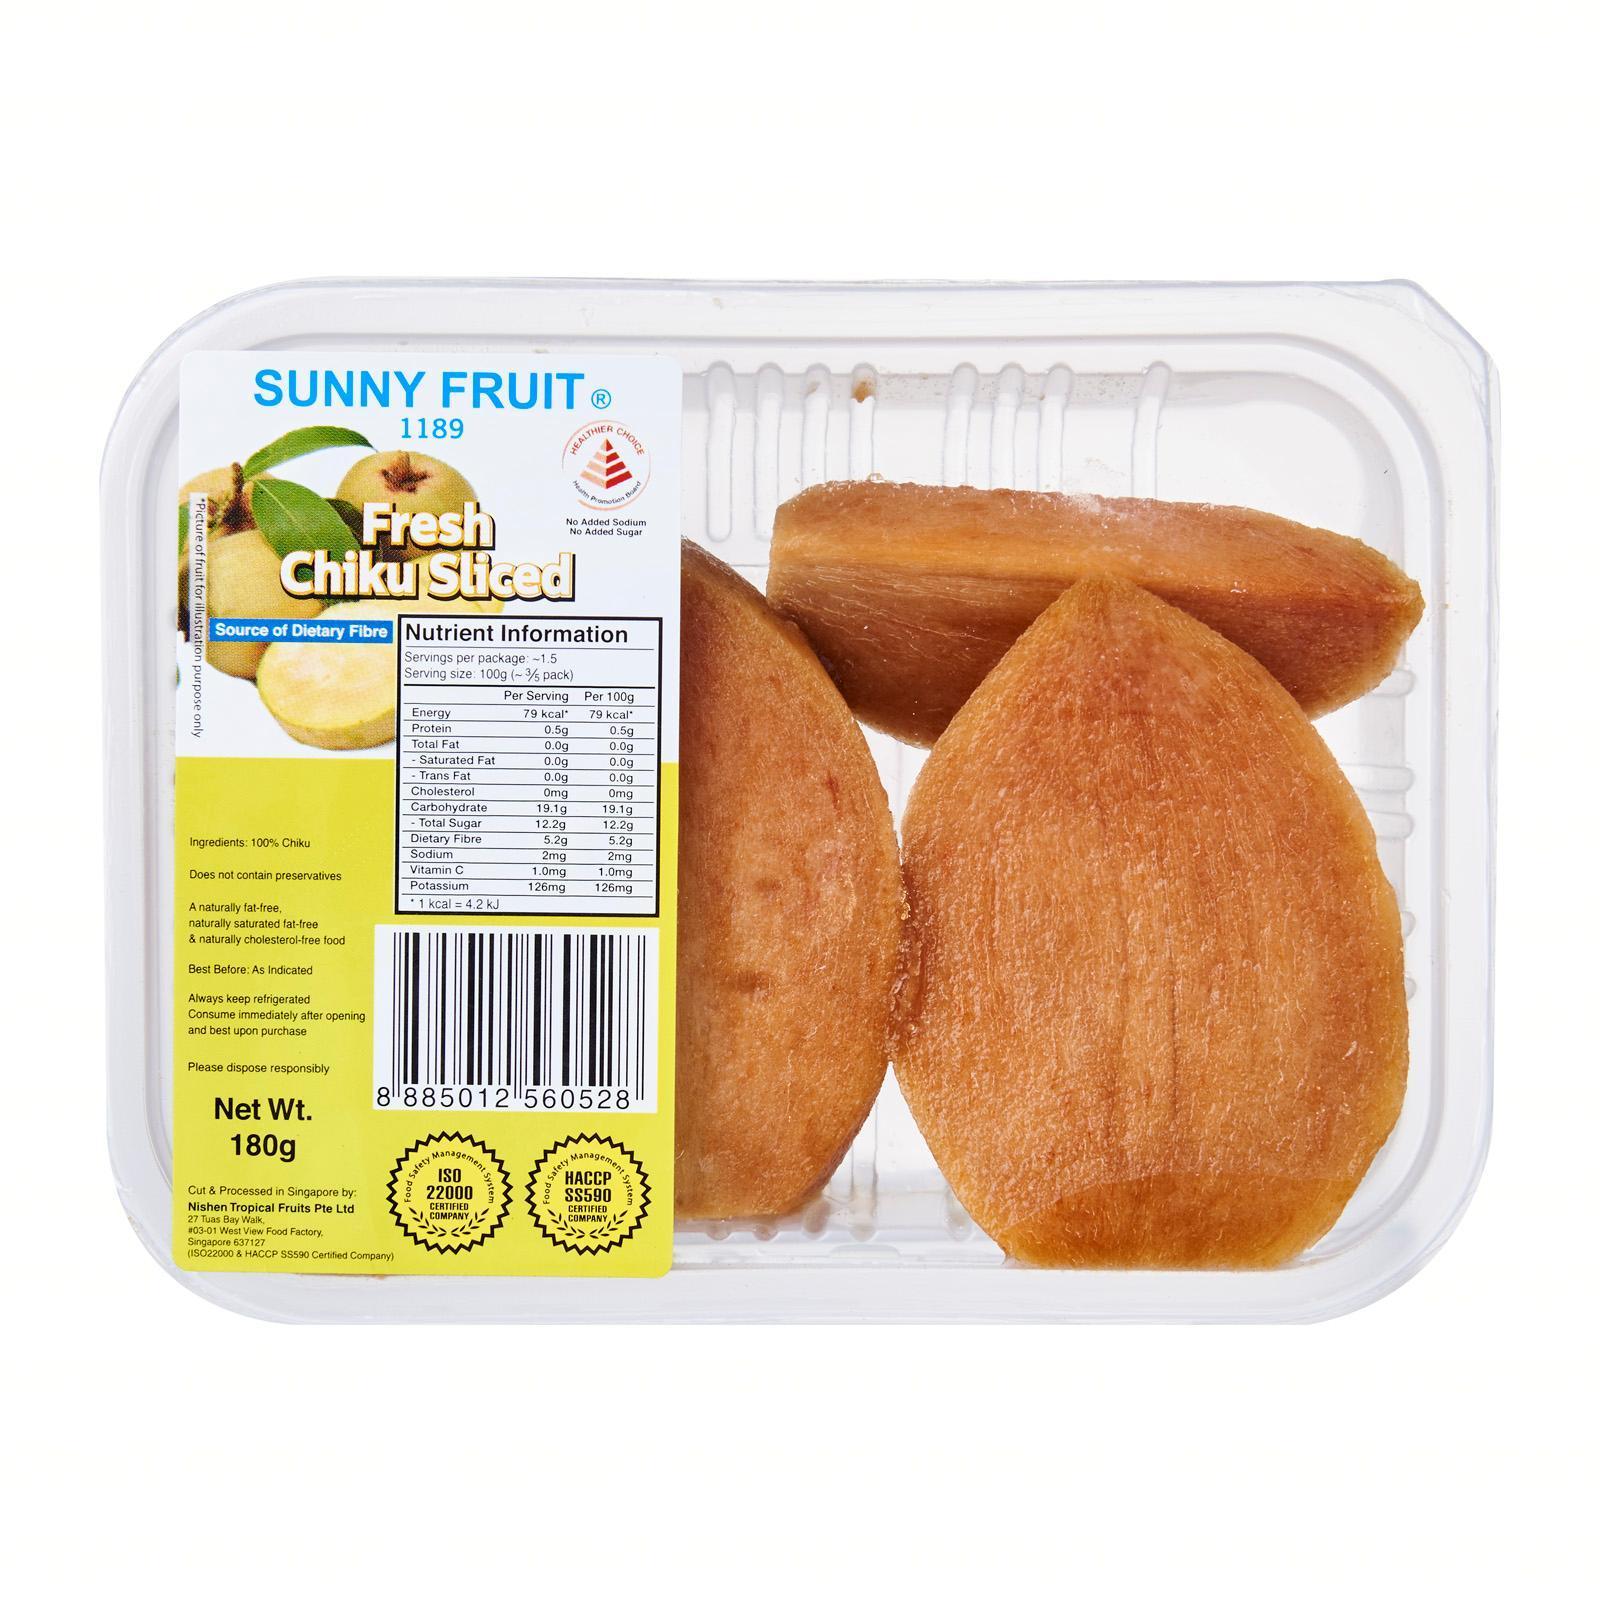 Sunny Fruit Fresh Chiku Sliced